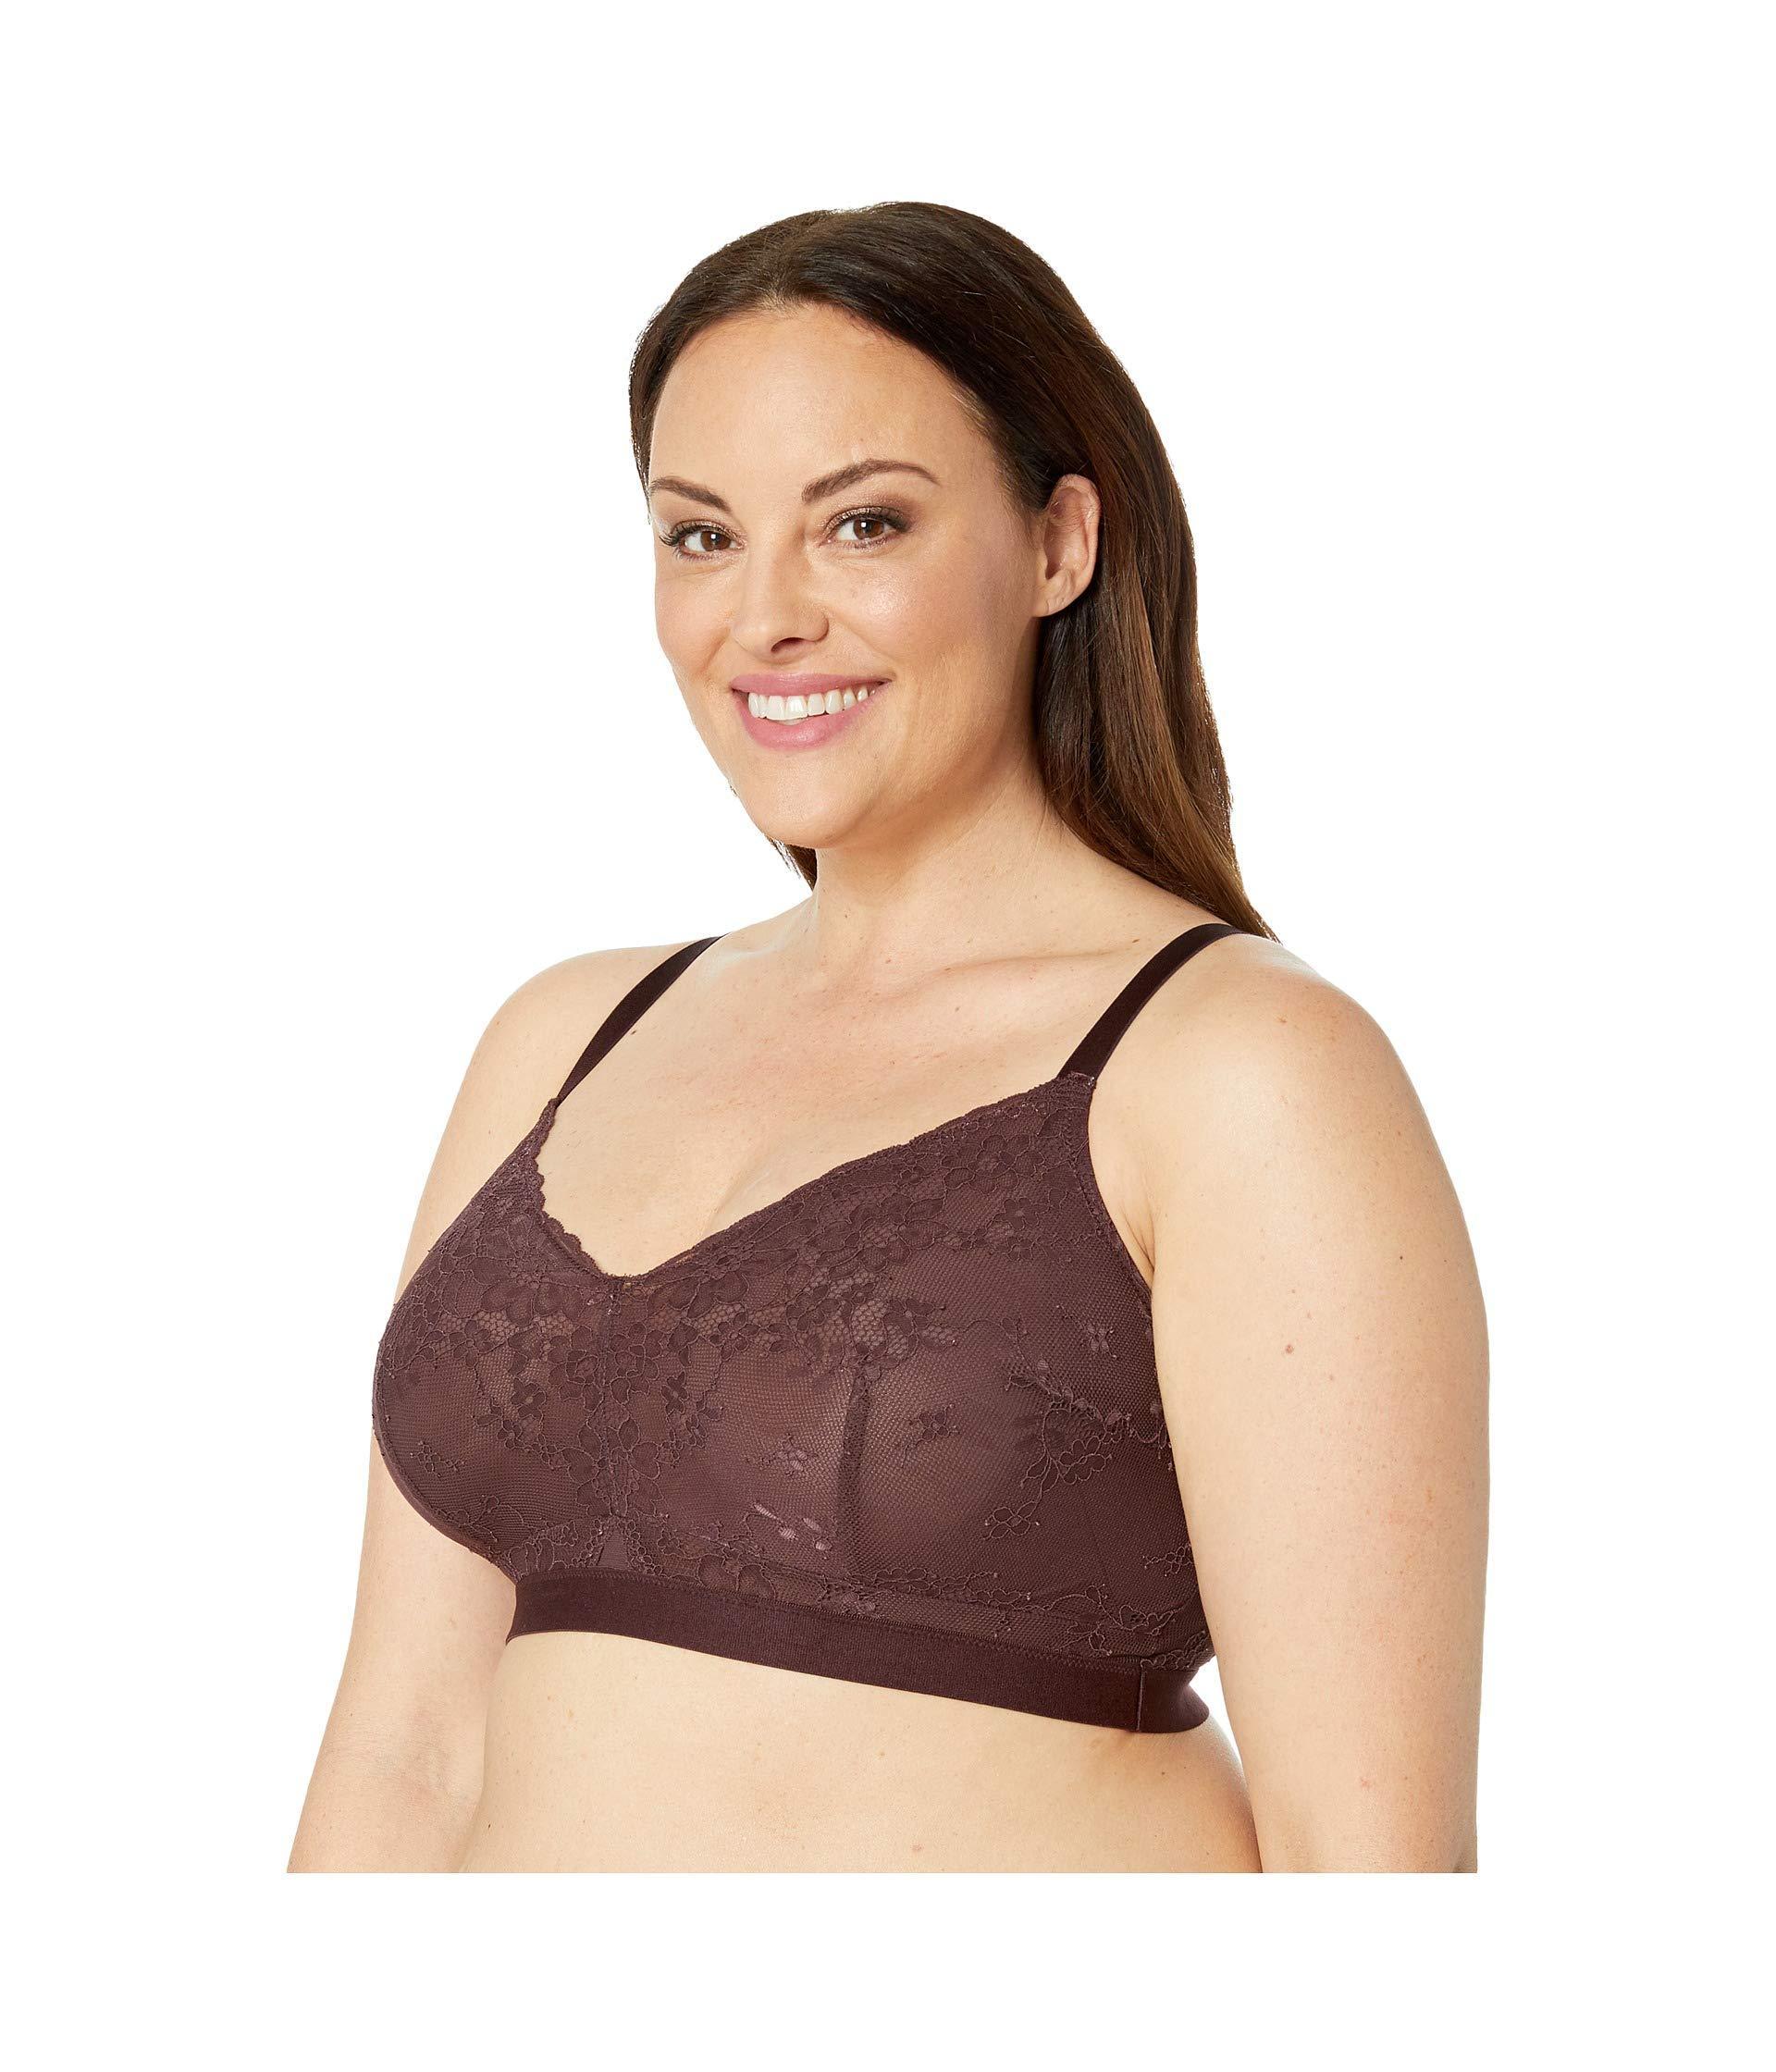 d5954102321 Lyst - Spanx Plus Size Spotlight On Lace Bralette - Save 17%